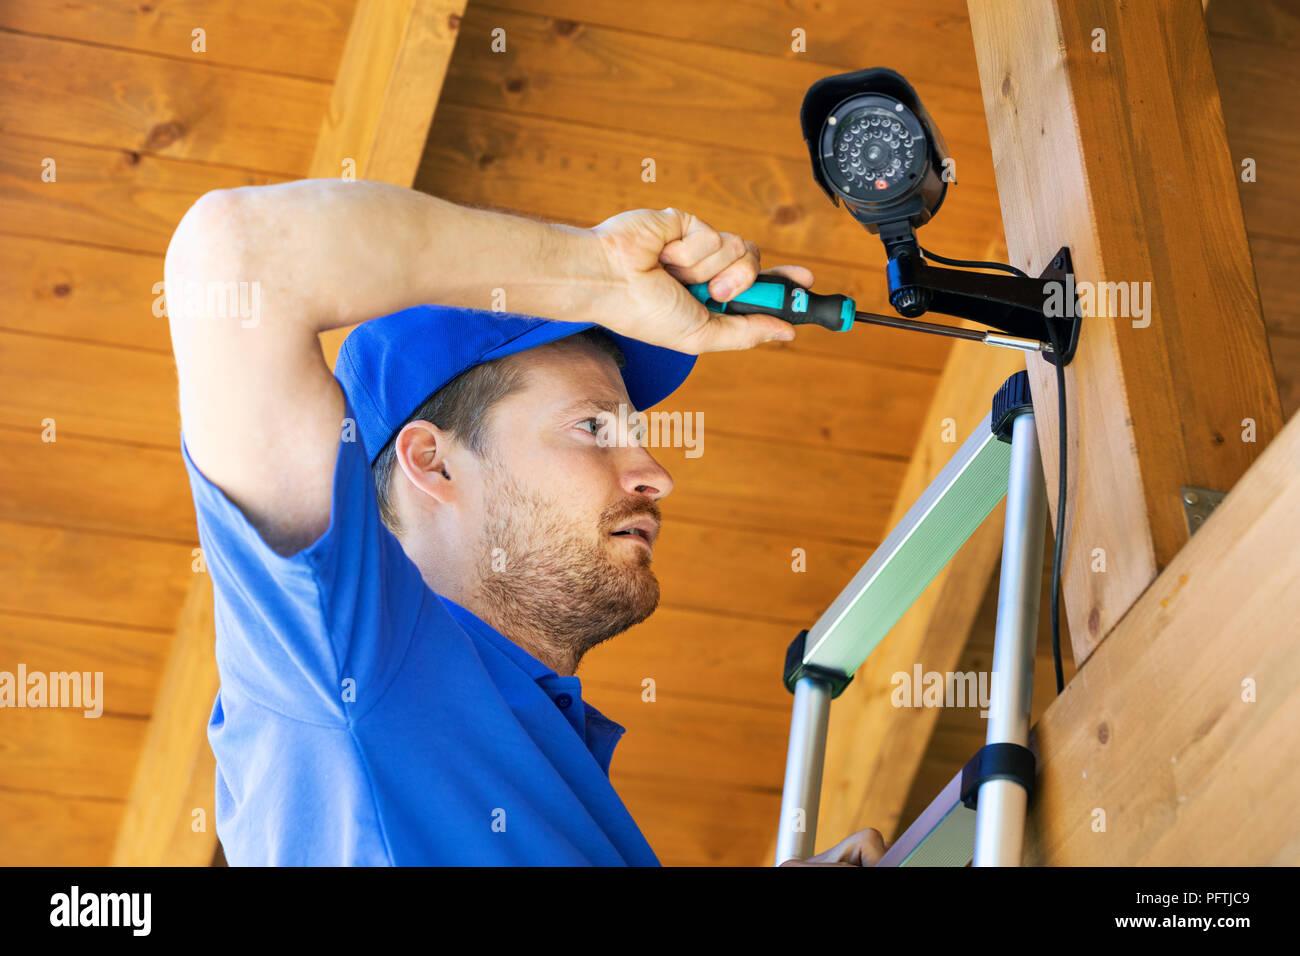 technician installing surveillance camera in the house carport - Stock Image